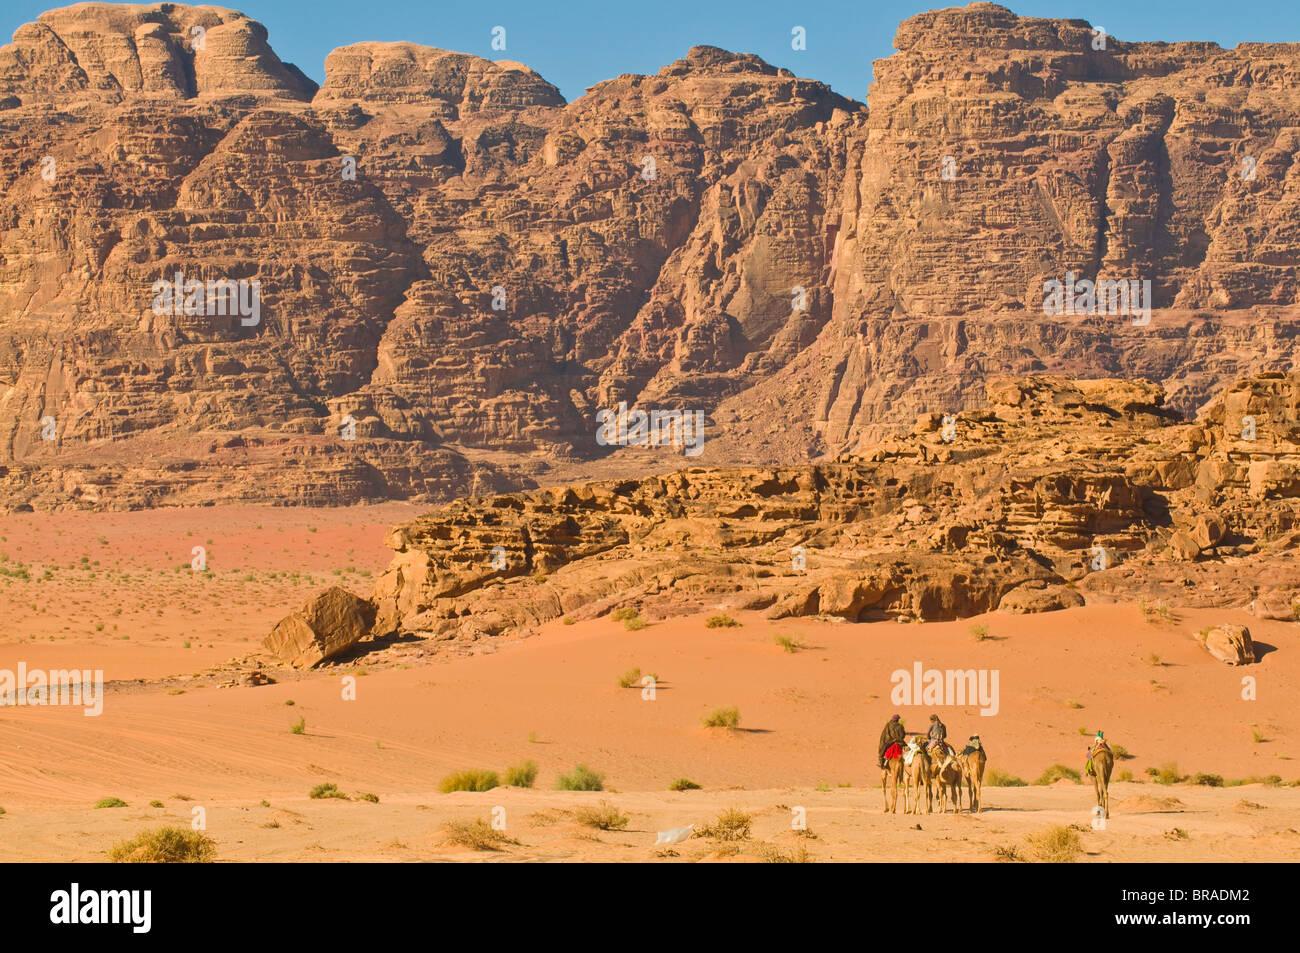 Camel caravan in the stunning desert scenery of Wadi Rum, Jordan, Middle East Stock Photo